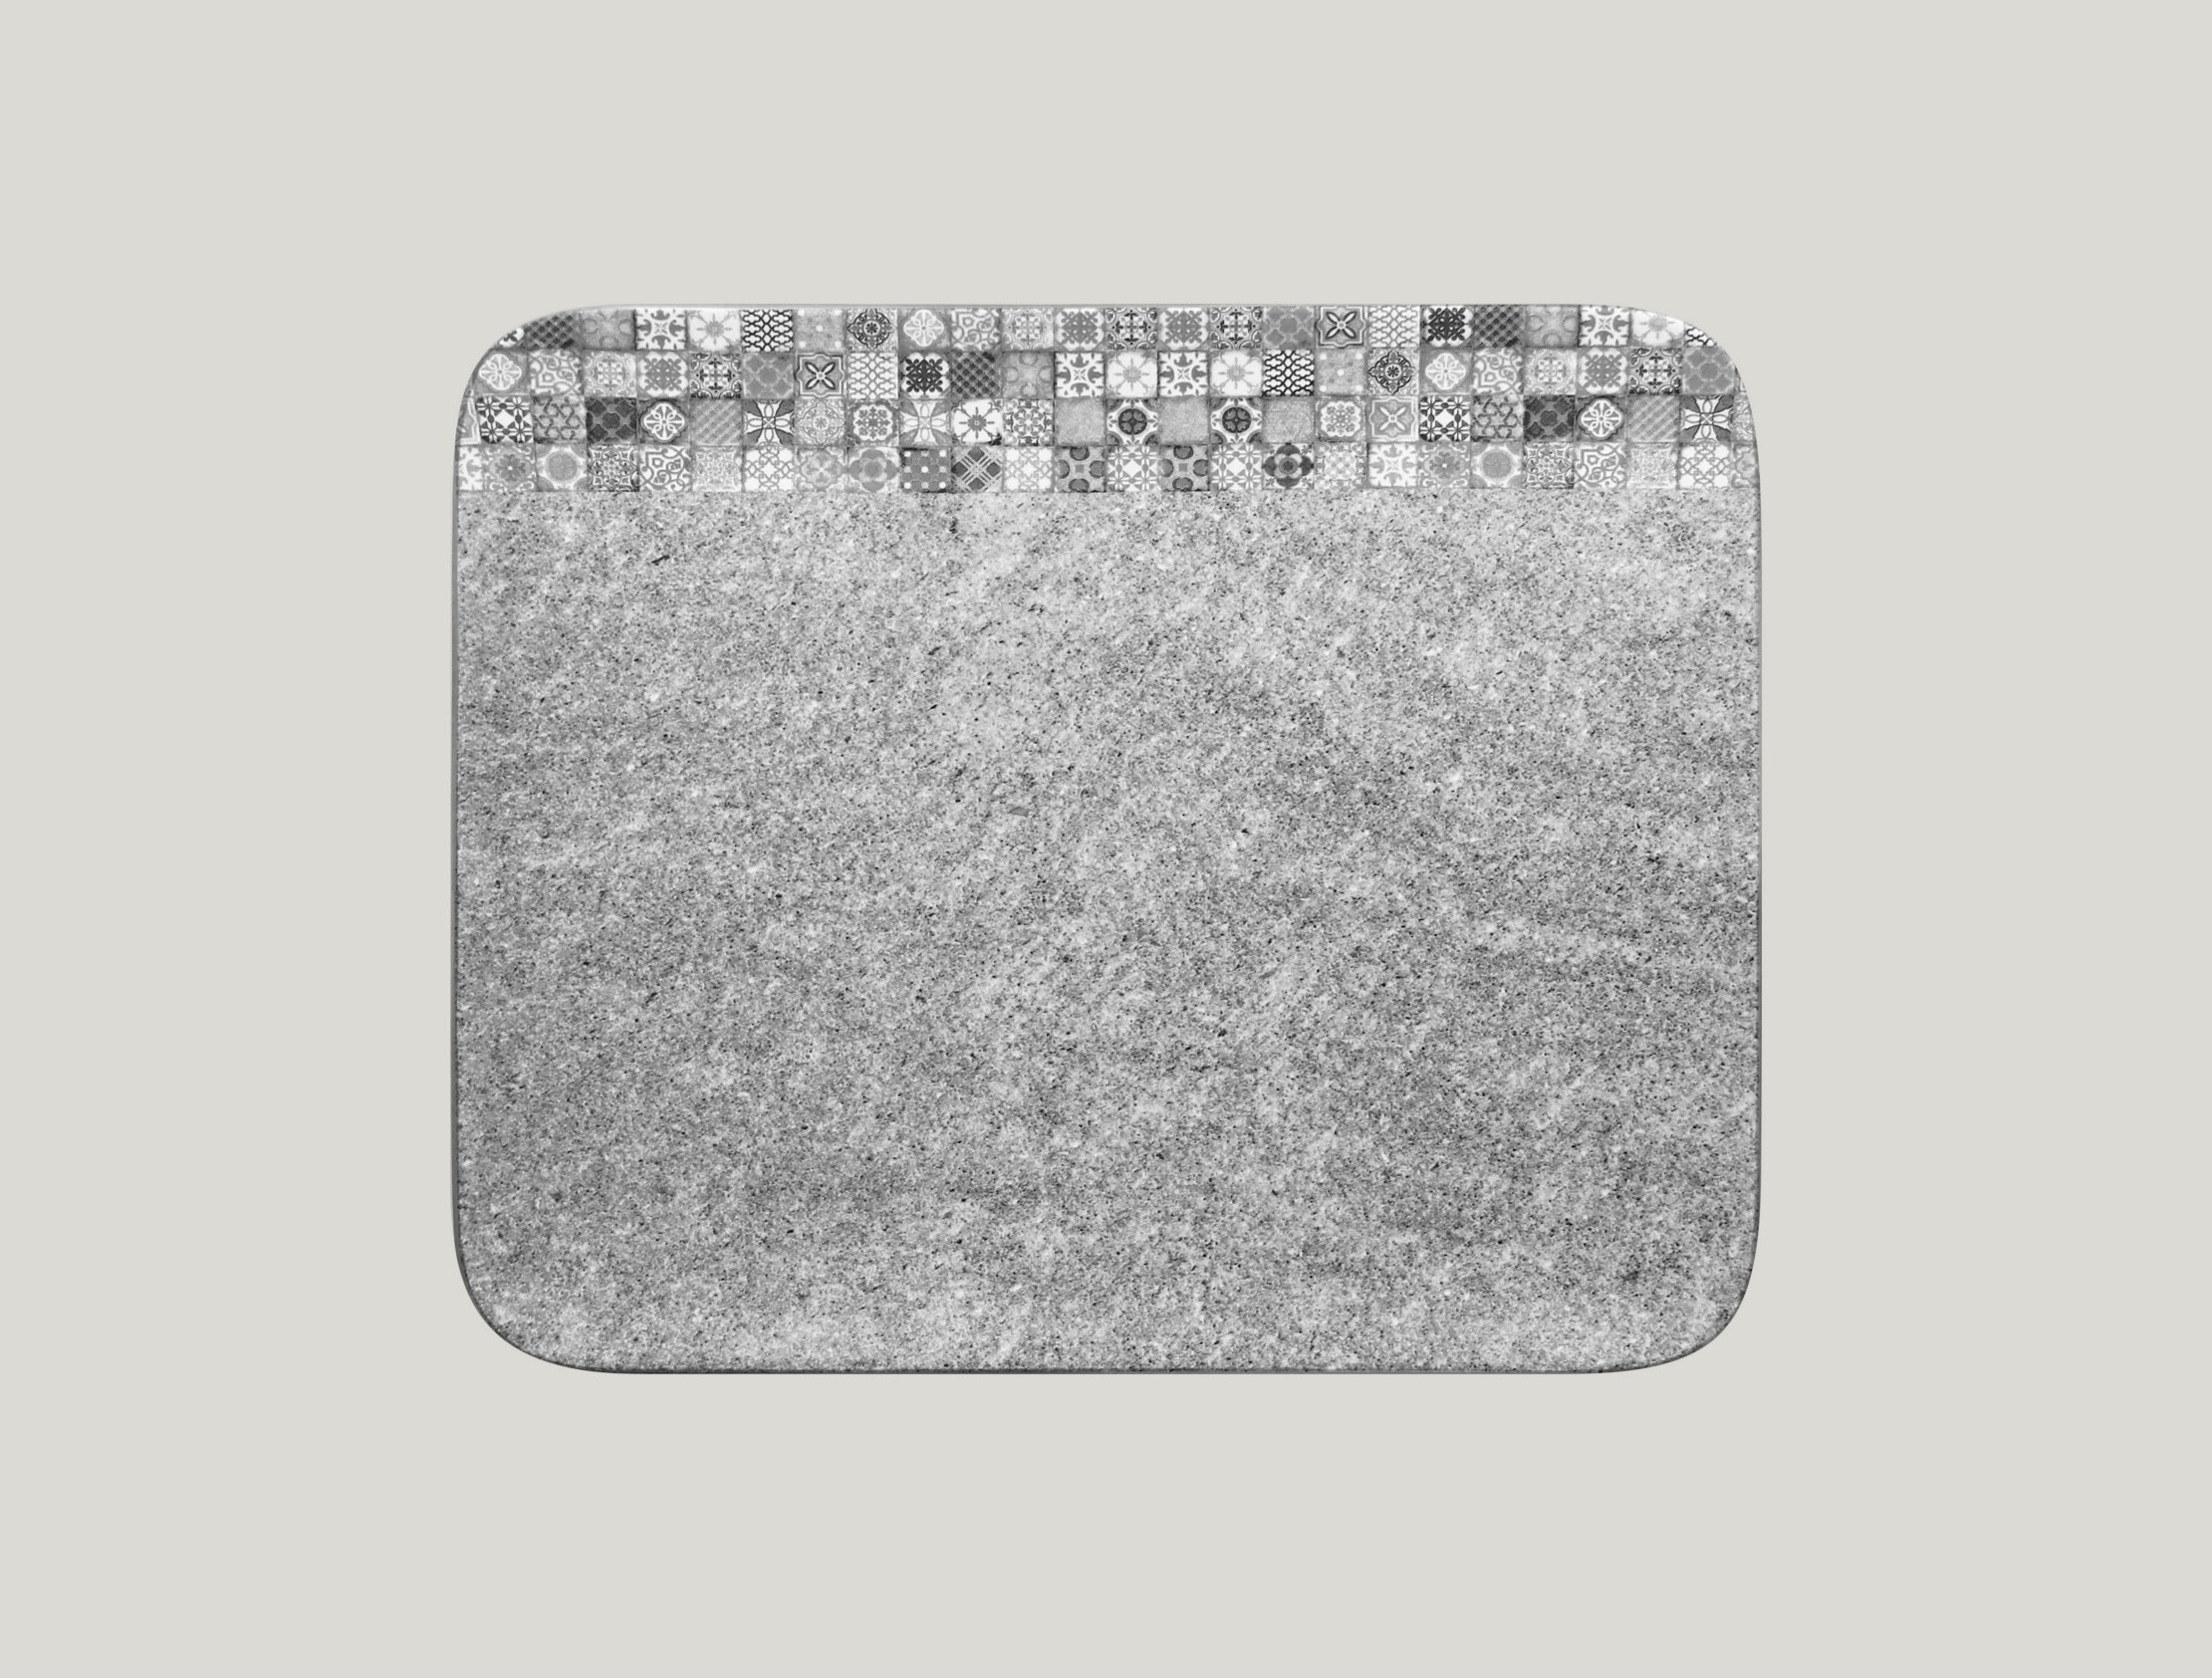 Talíř obdélníkový 33 x 27 cm - šedá